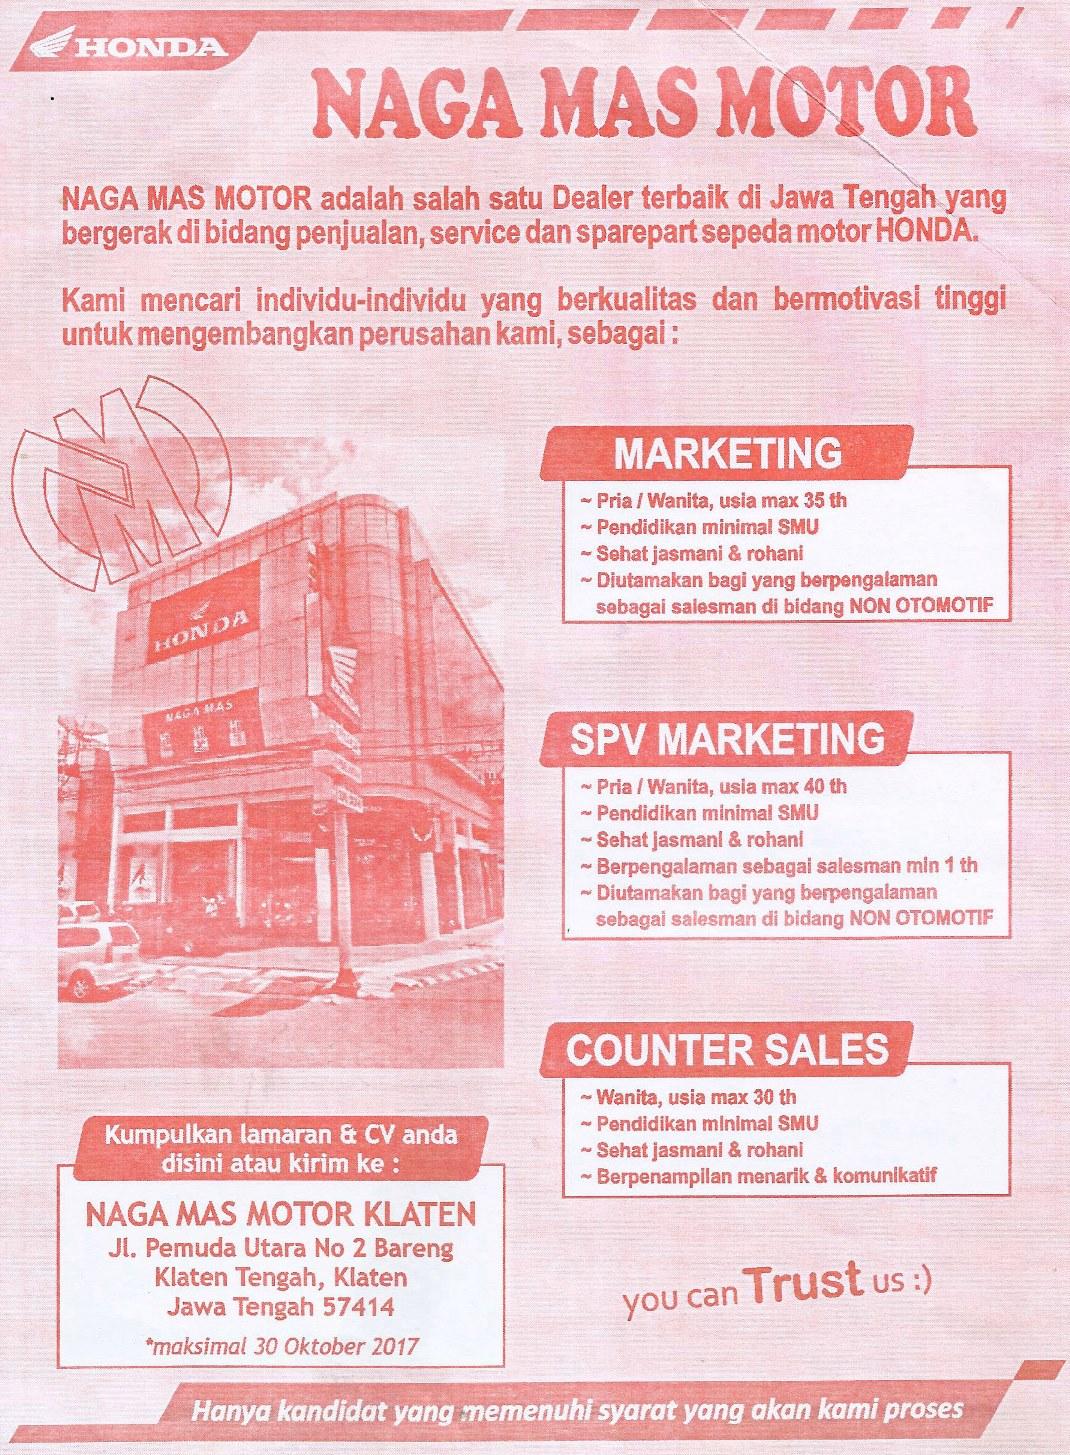 Lowongan kerja Oktober 2017 Marketing, Supervisor Marketing, Counter Sales Honda Naga Mas Motor Klaten, Boyolali, Wonogiri, Sukoharjo, Karanganyar, Surakarta, Tegal, Bandung, Slawi.